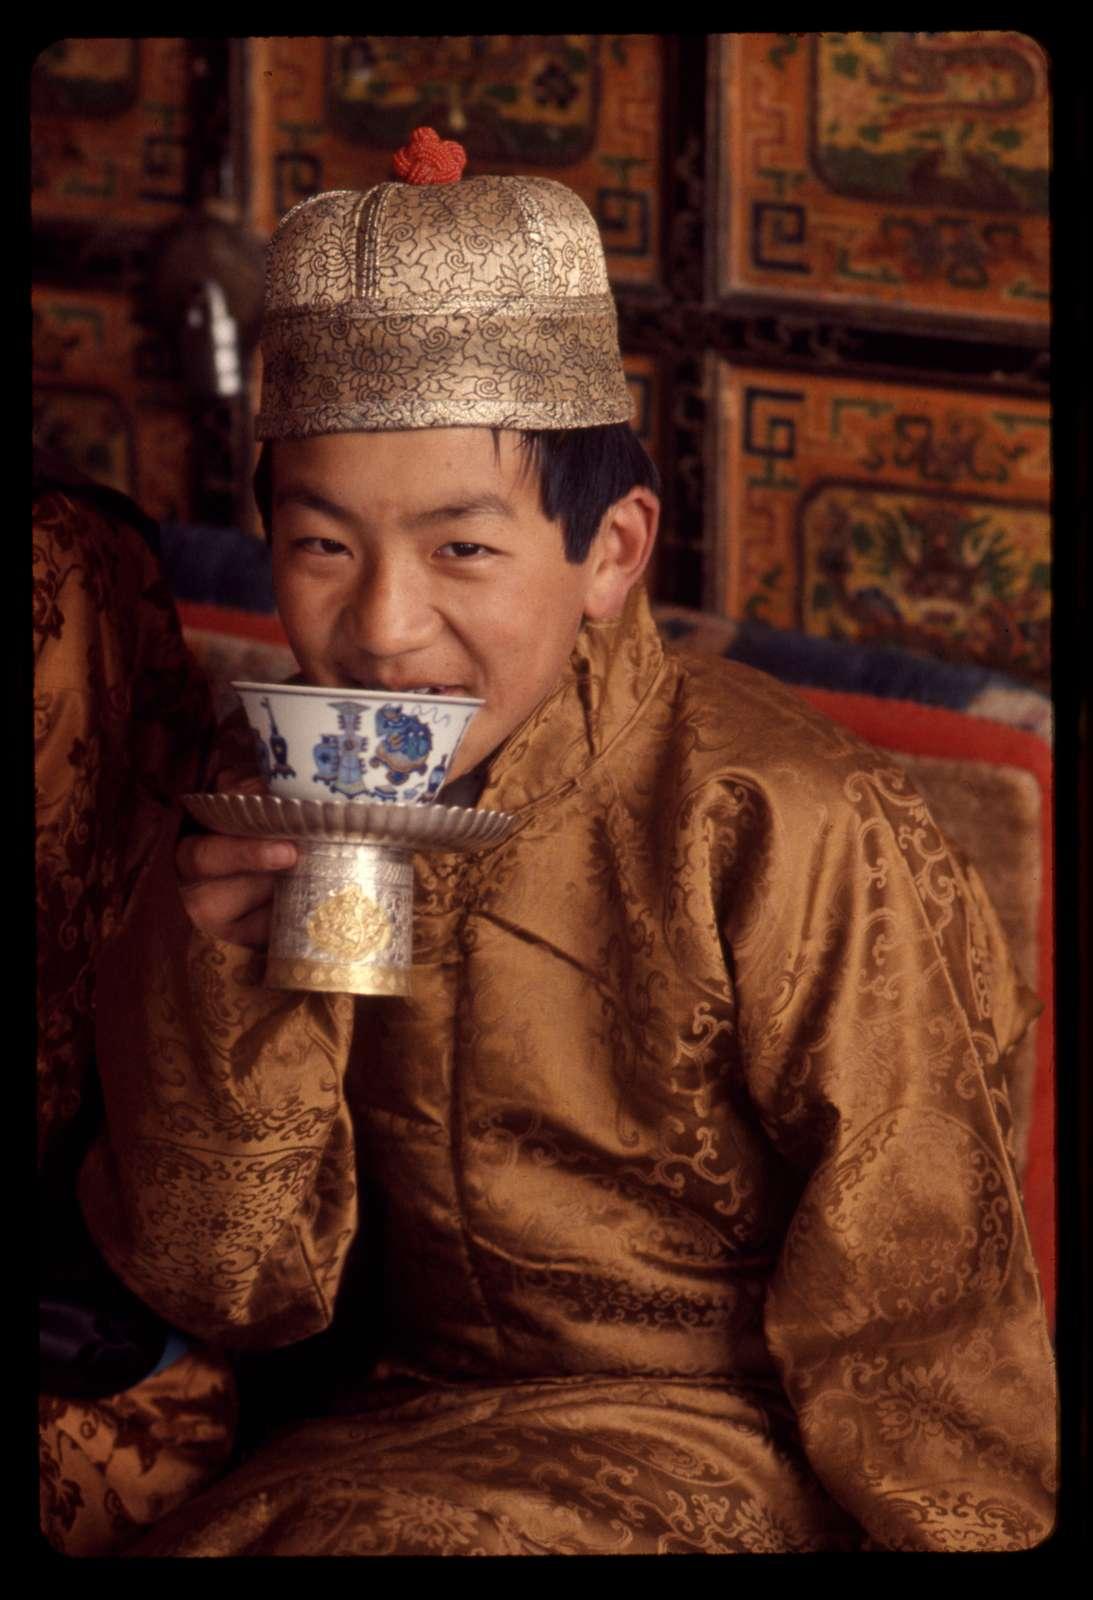 [Son of Rai Bahadur Sonam Tobden, a Sikkimese nobleman, drinking from cup, Sikkim]